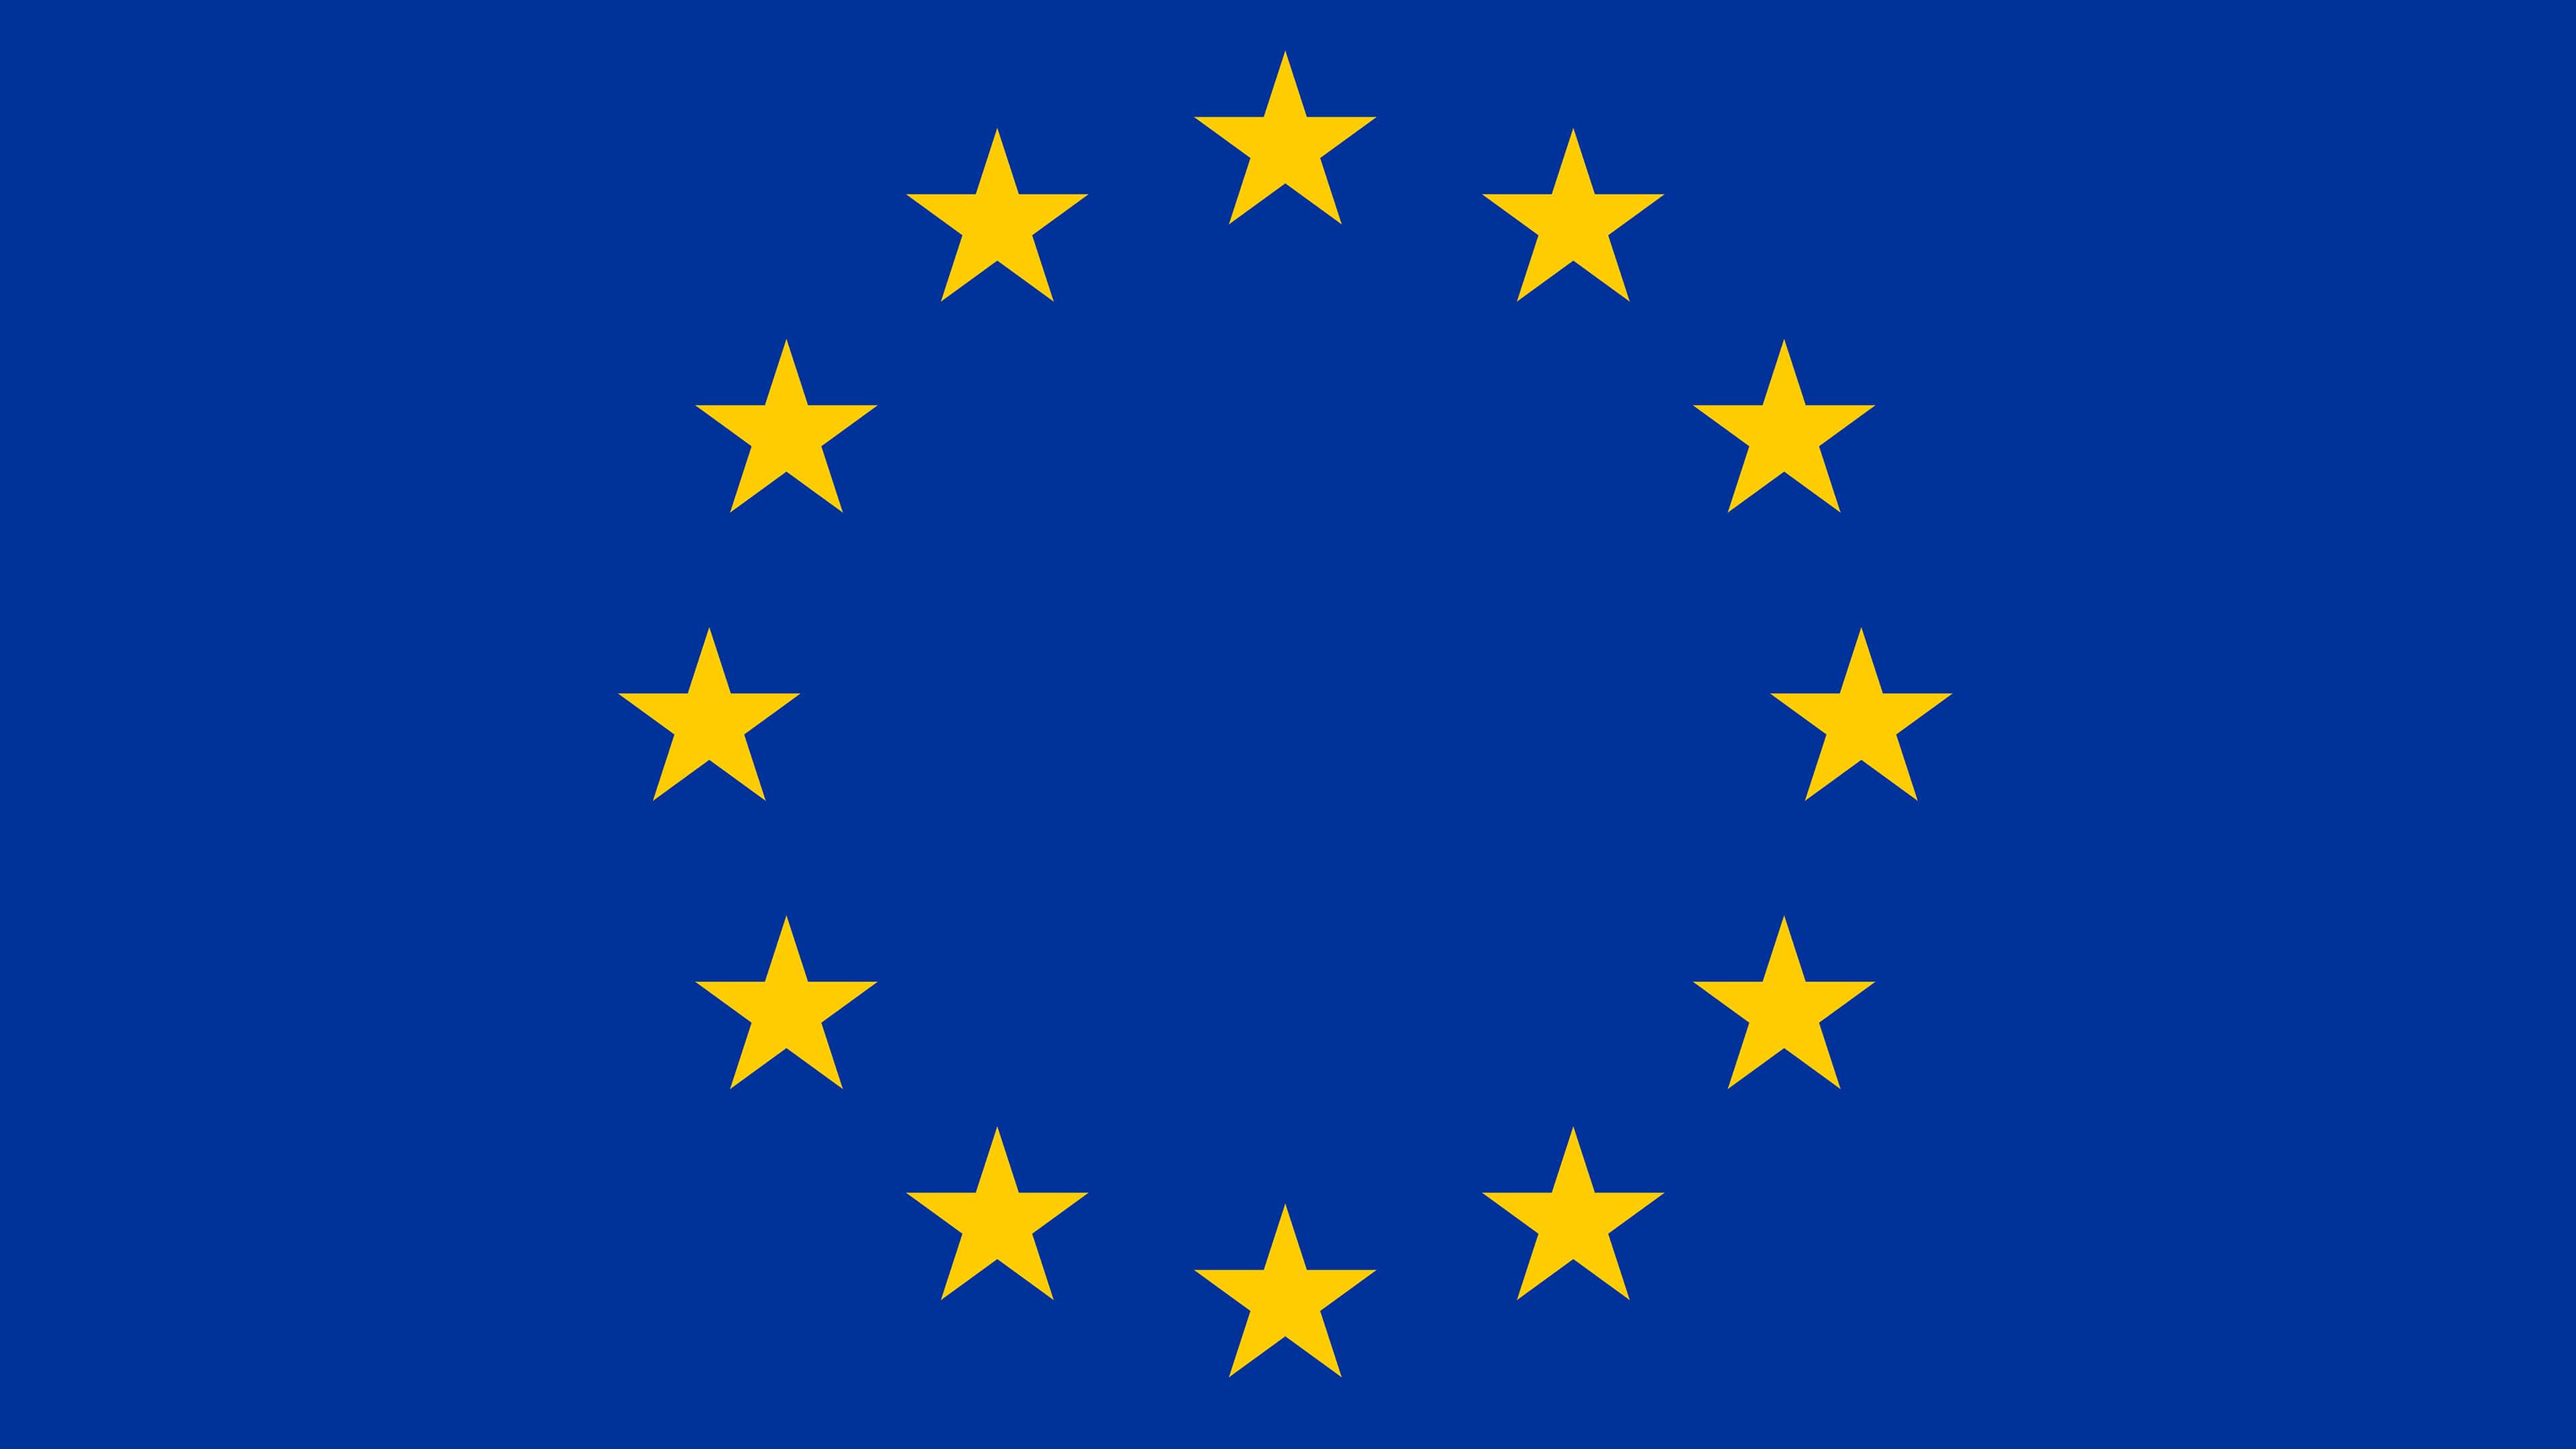 Europe Flag UHD 4K Wallpaper Pixelz 3840x2160